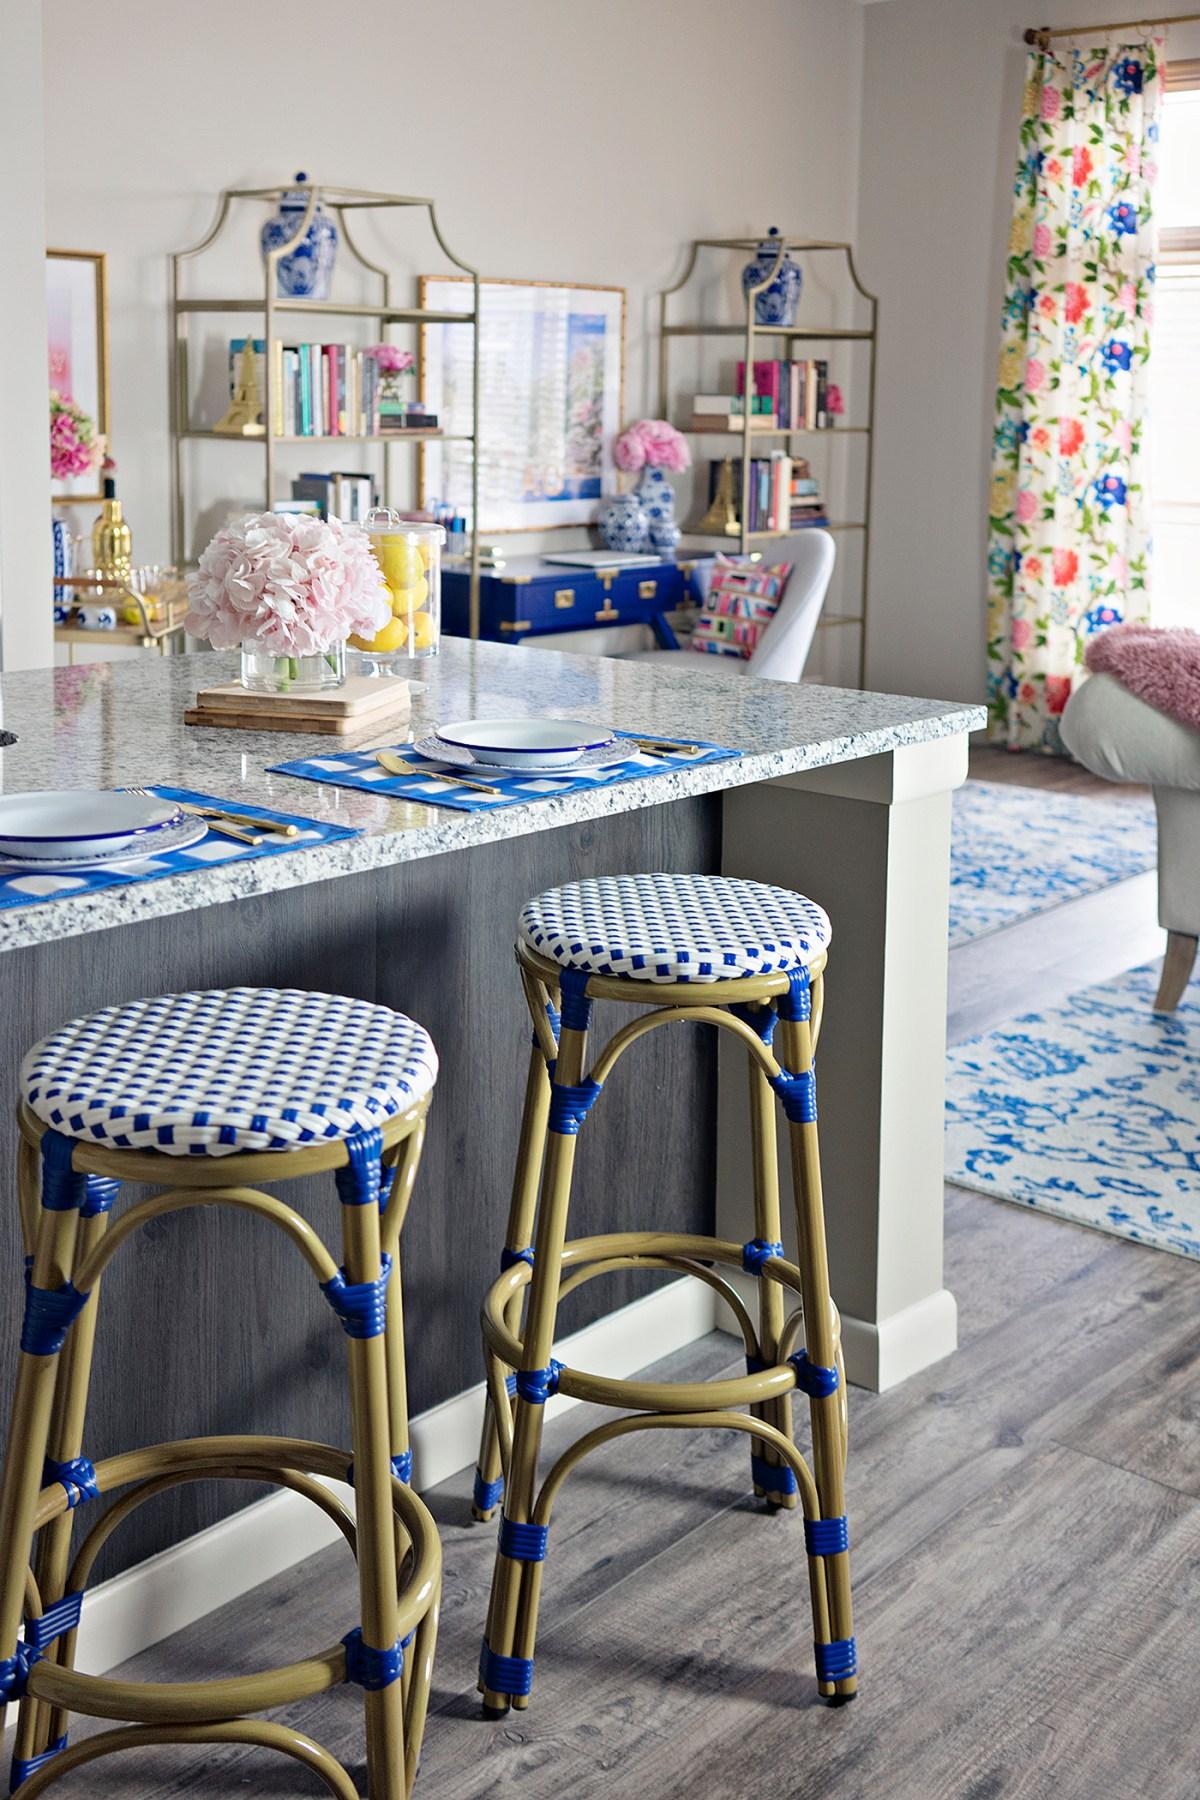 Colorful, Preppy Decor for Small Spaces